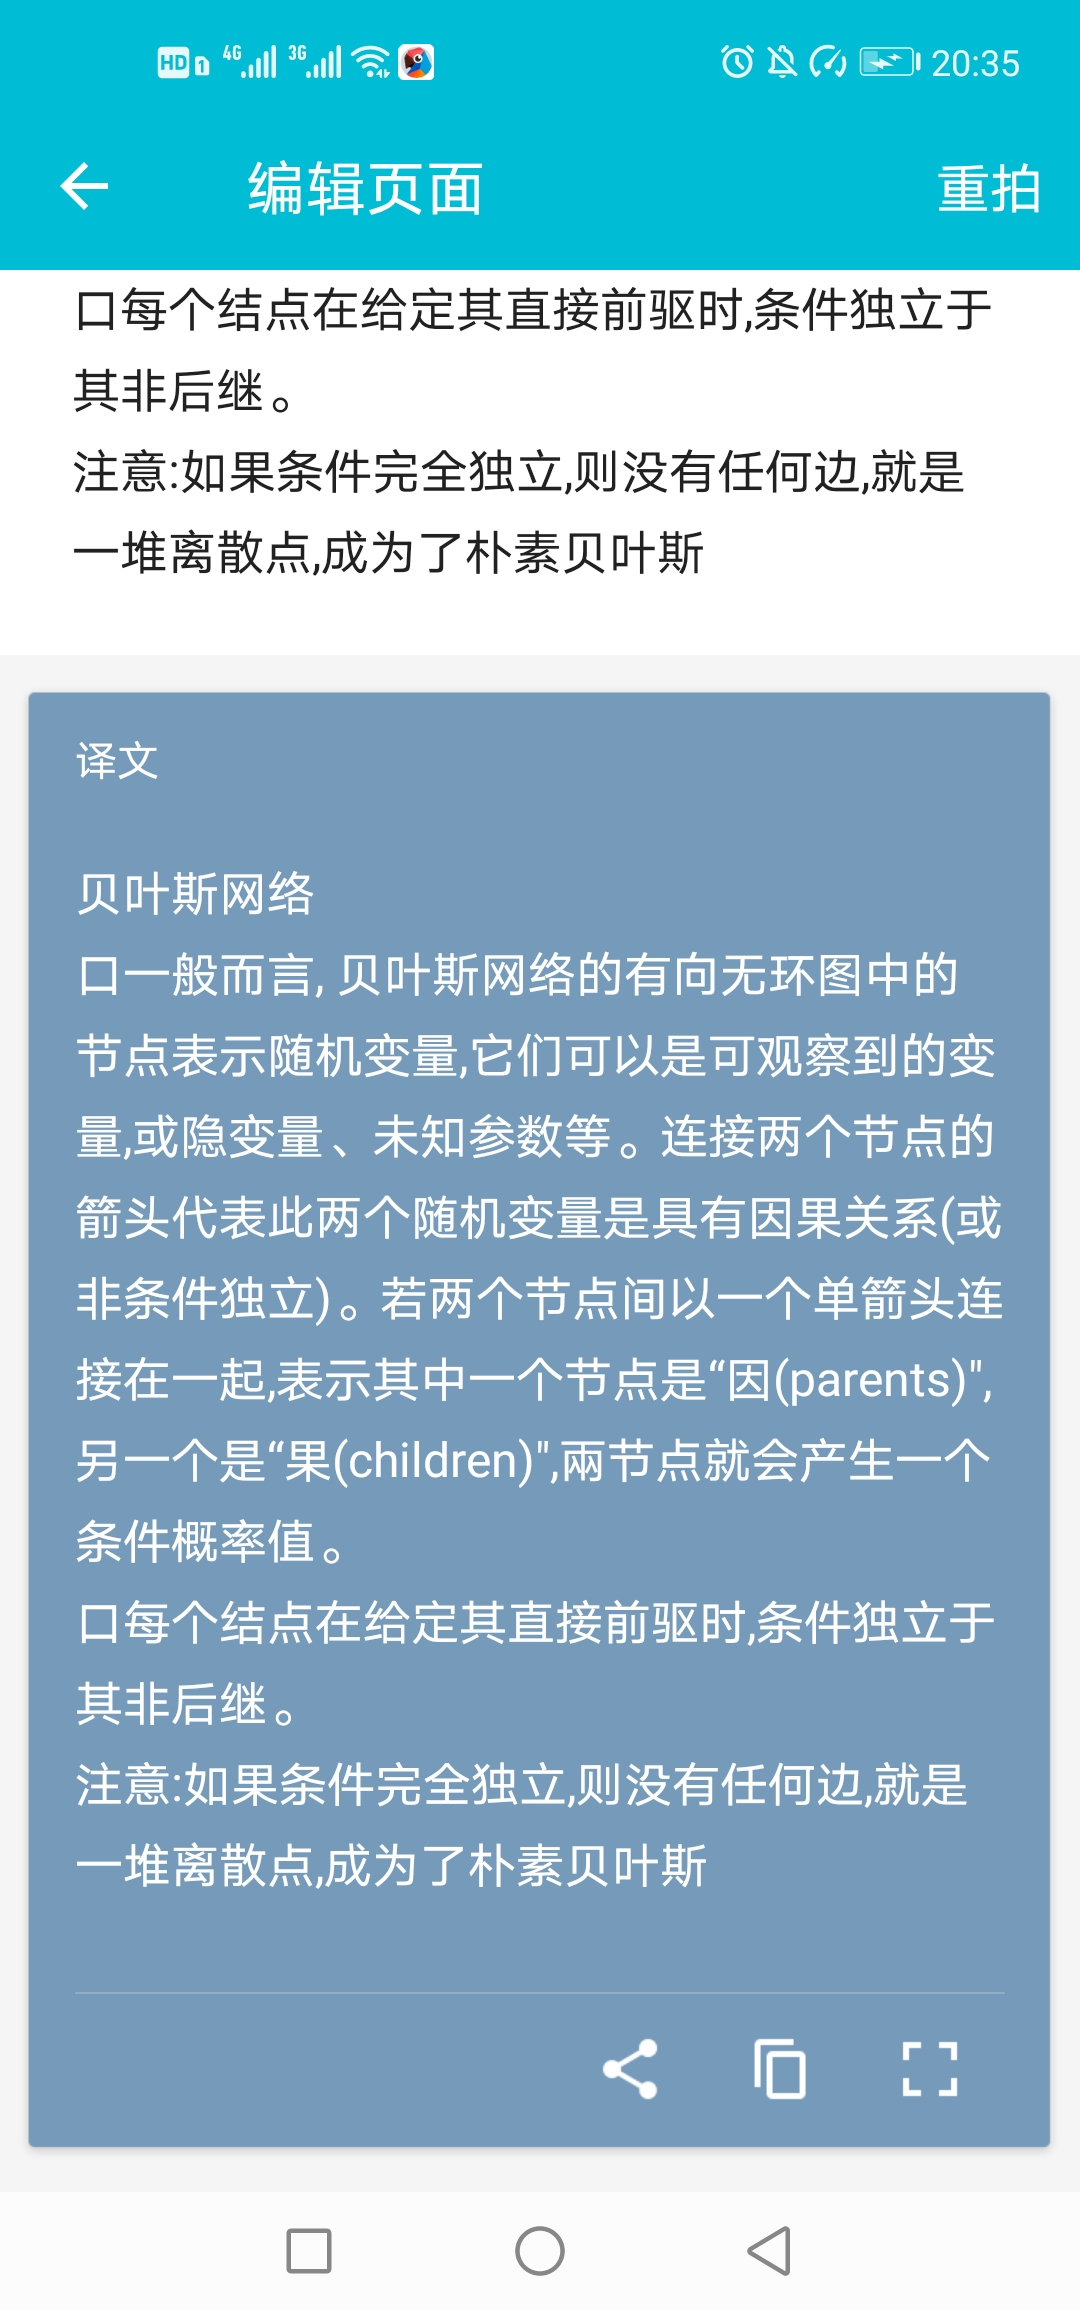 Screenshot_20200330_203520_com.youdao.translator.jpg